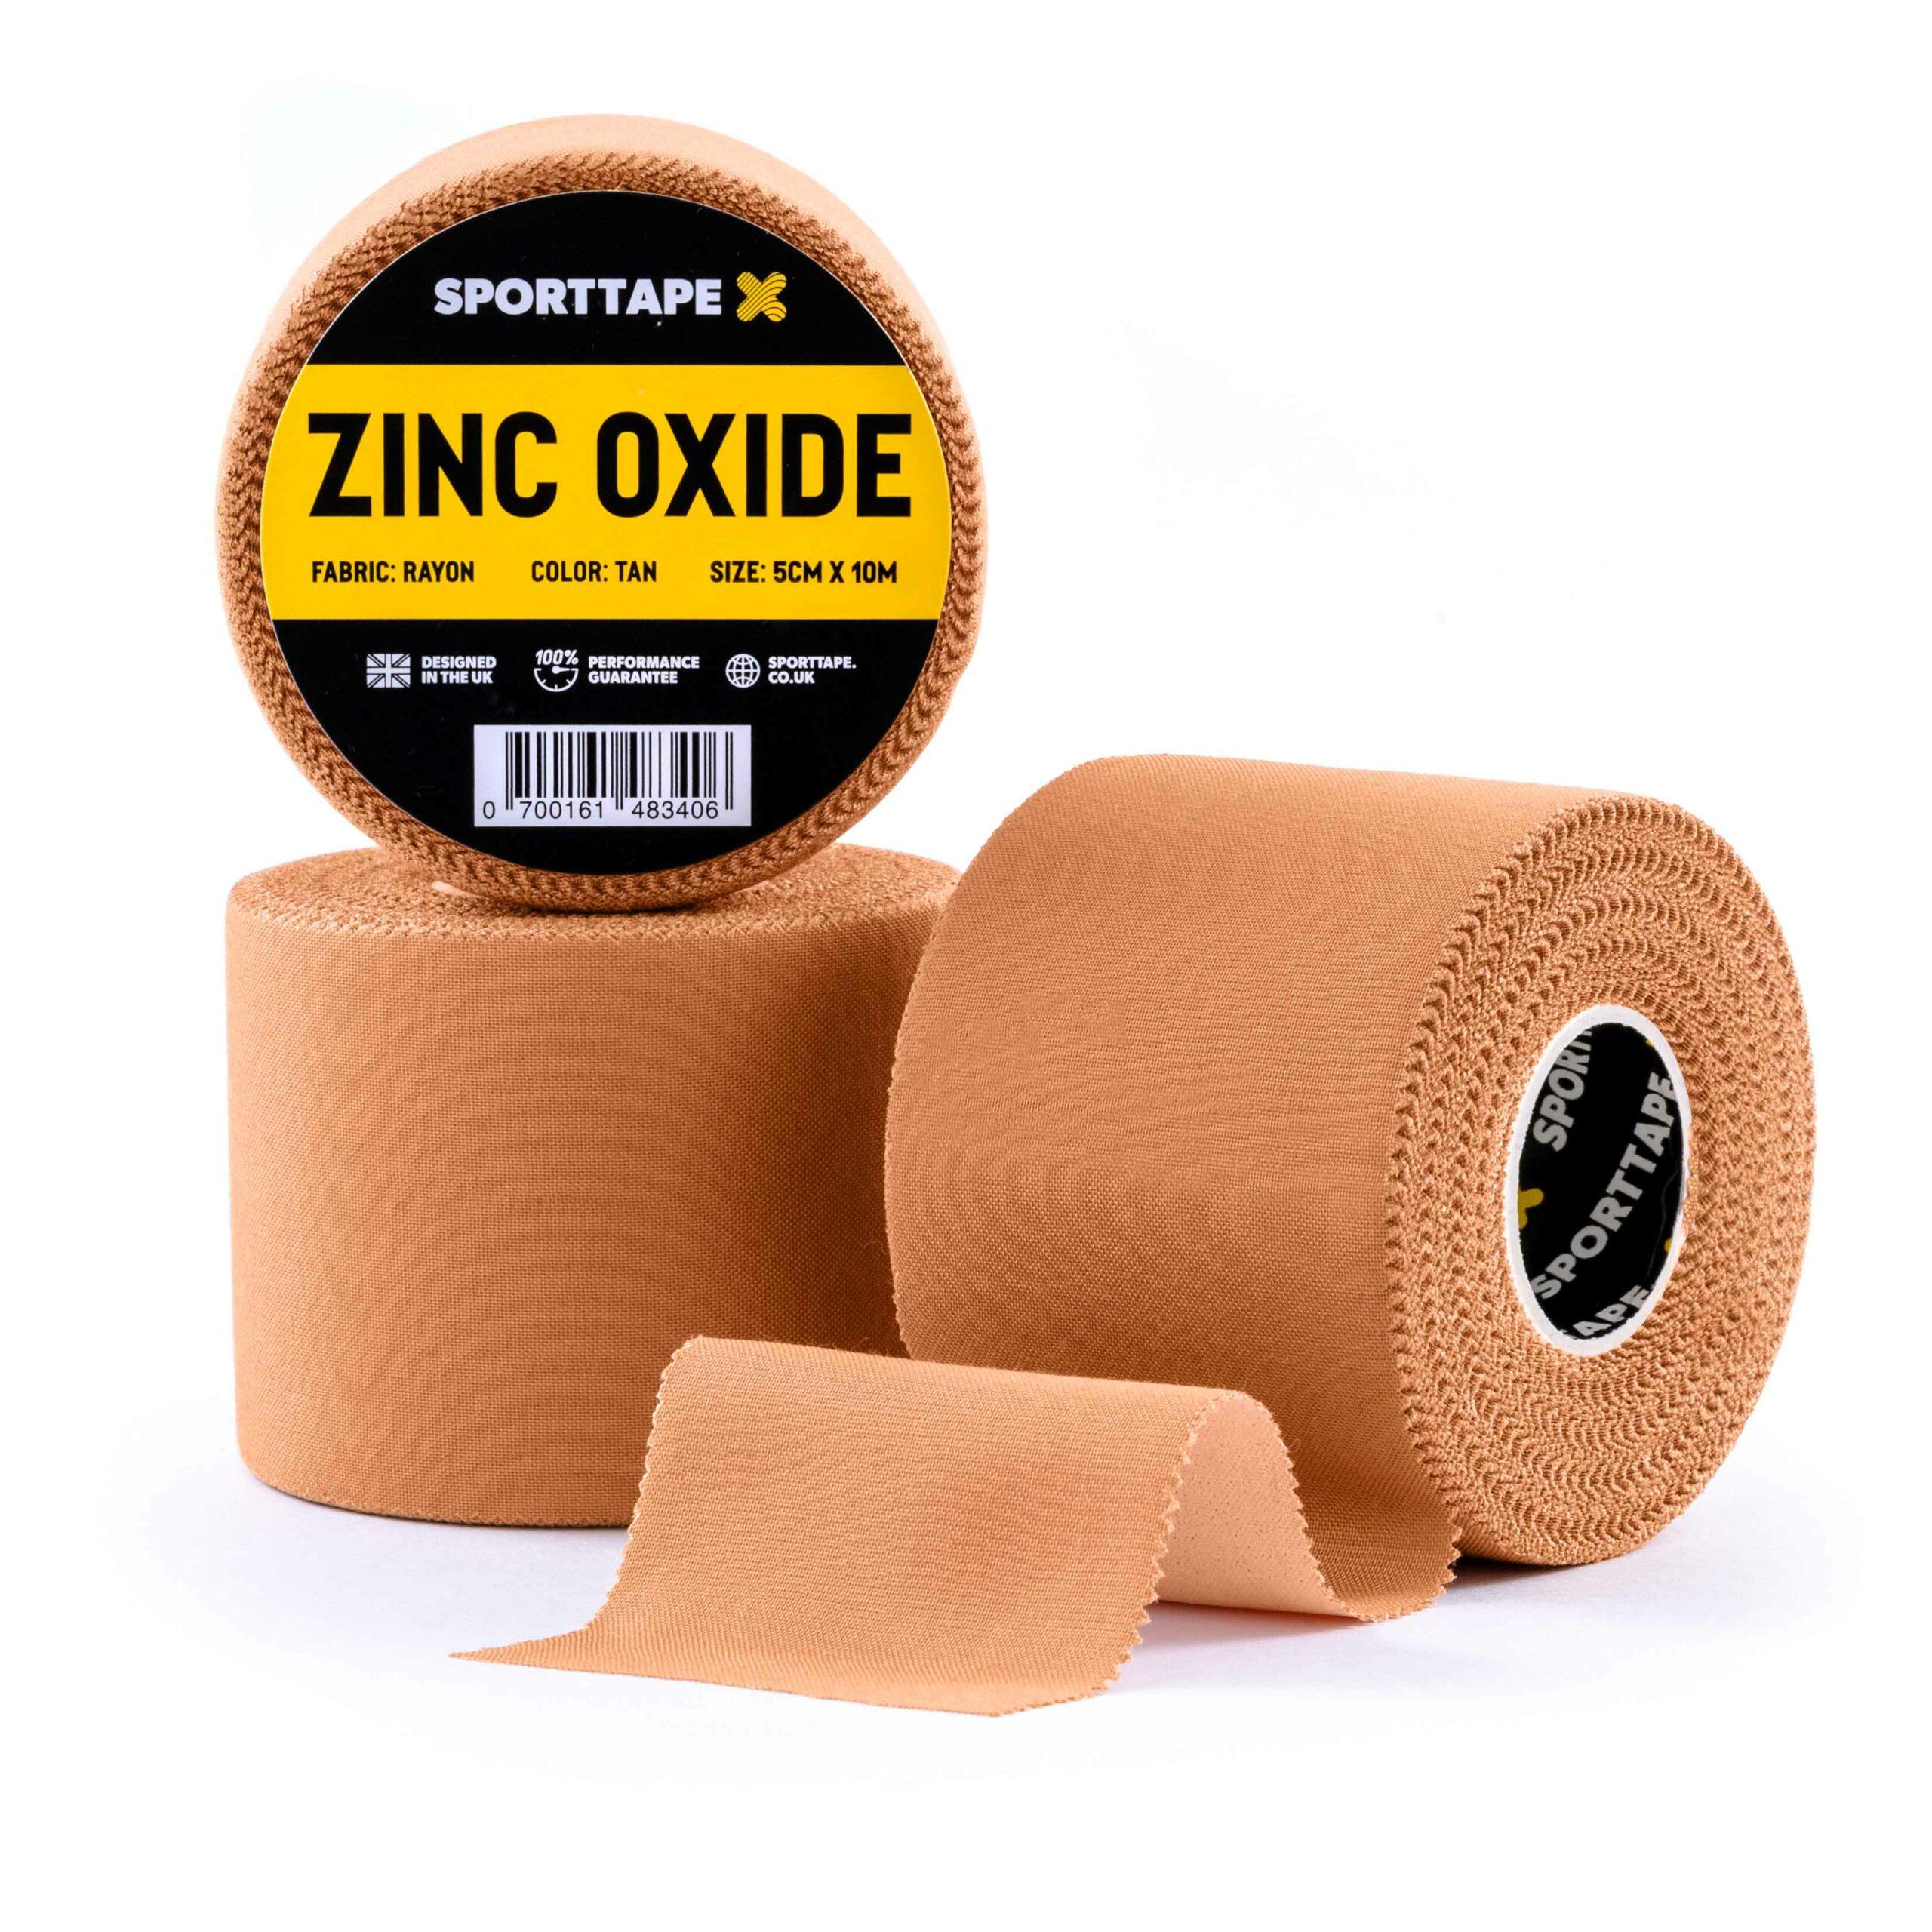 Zinc Oxide 5cm x 10m Tan 3 Rolls